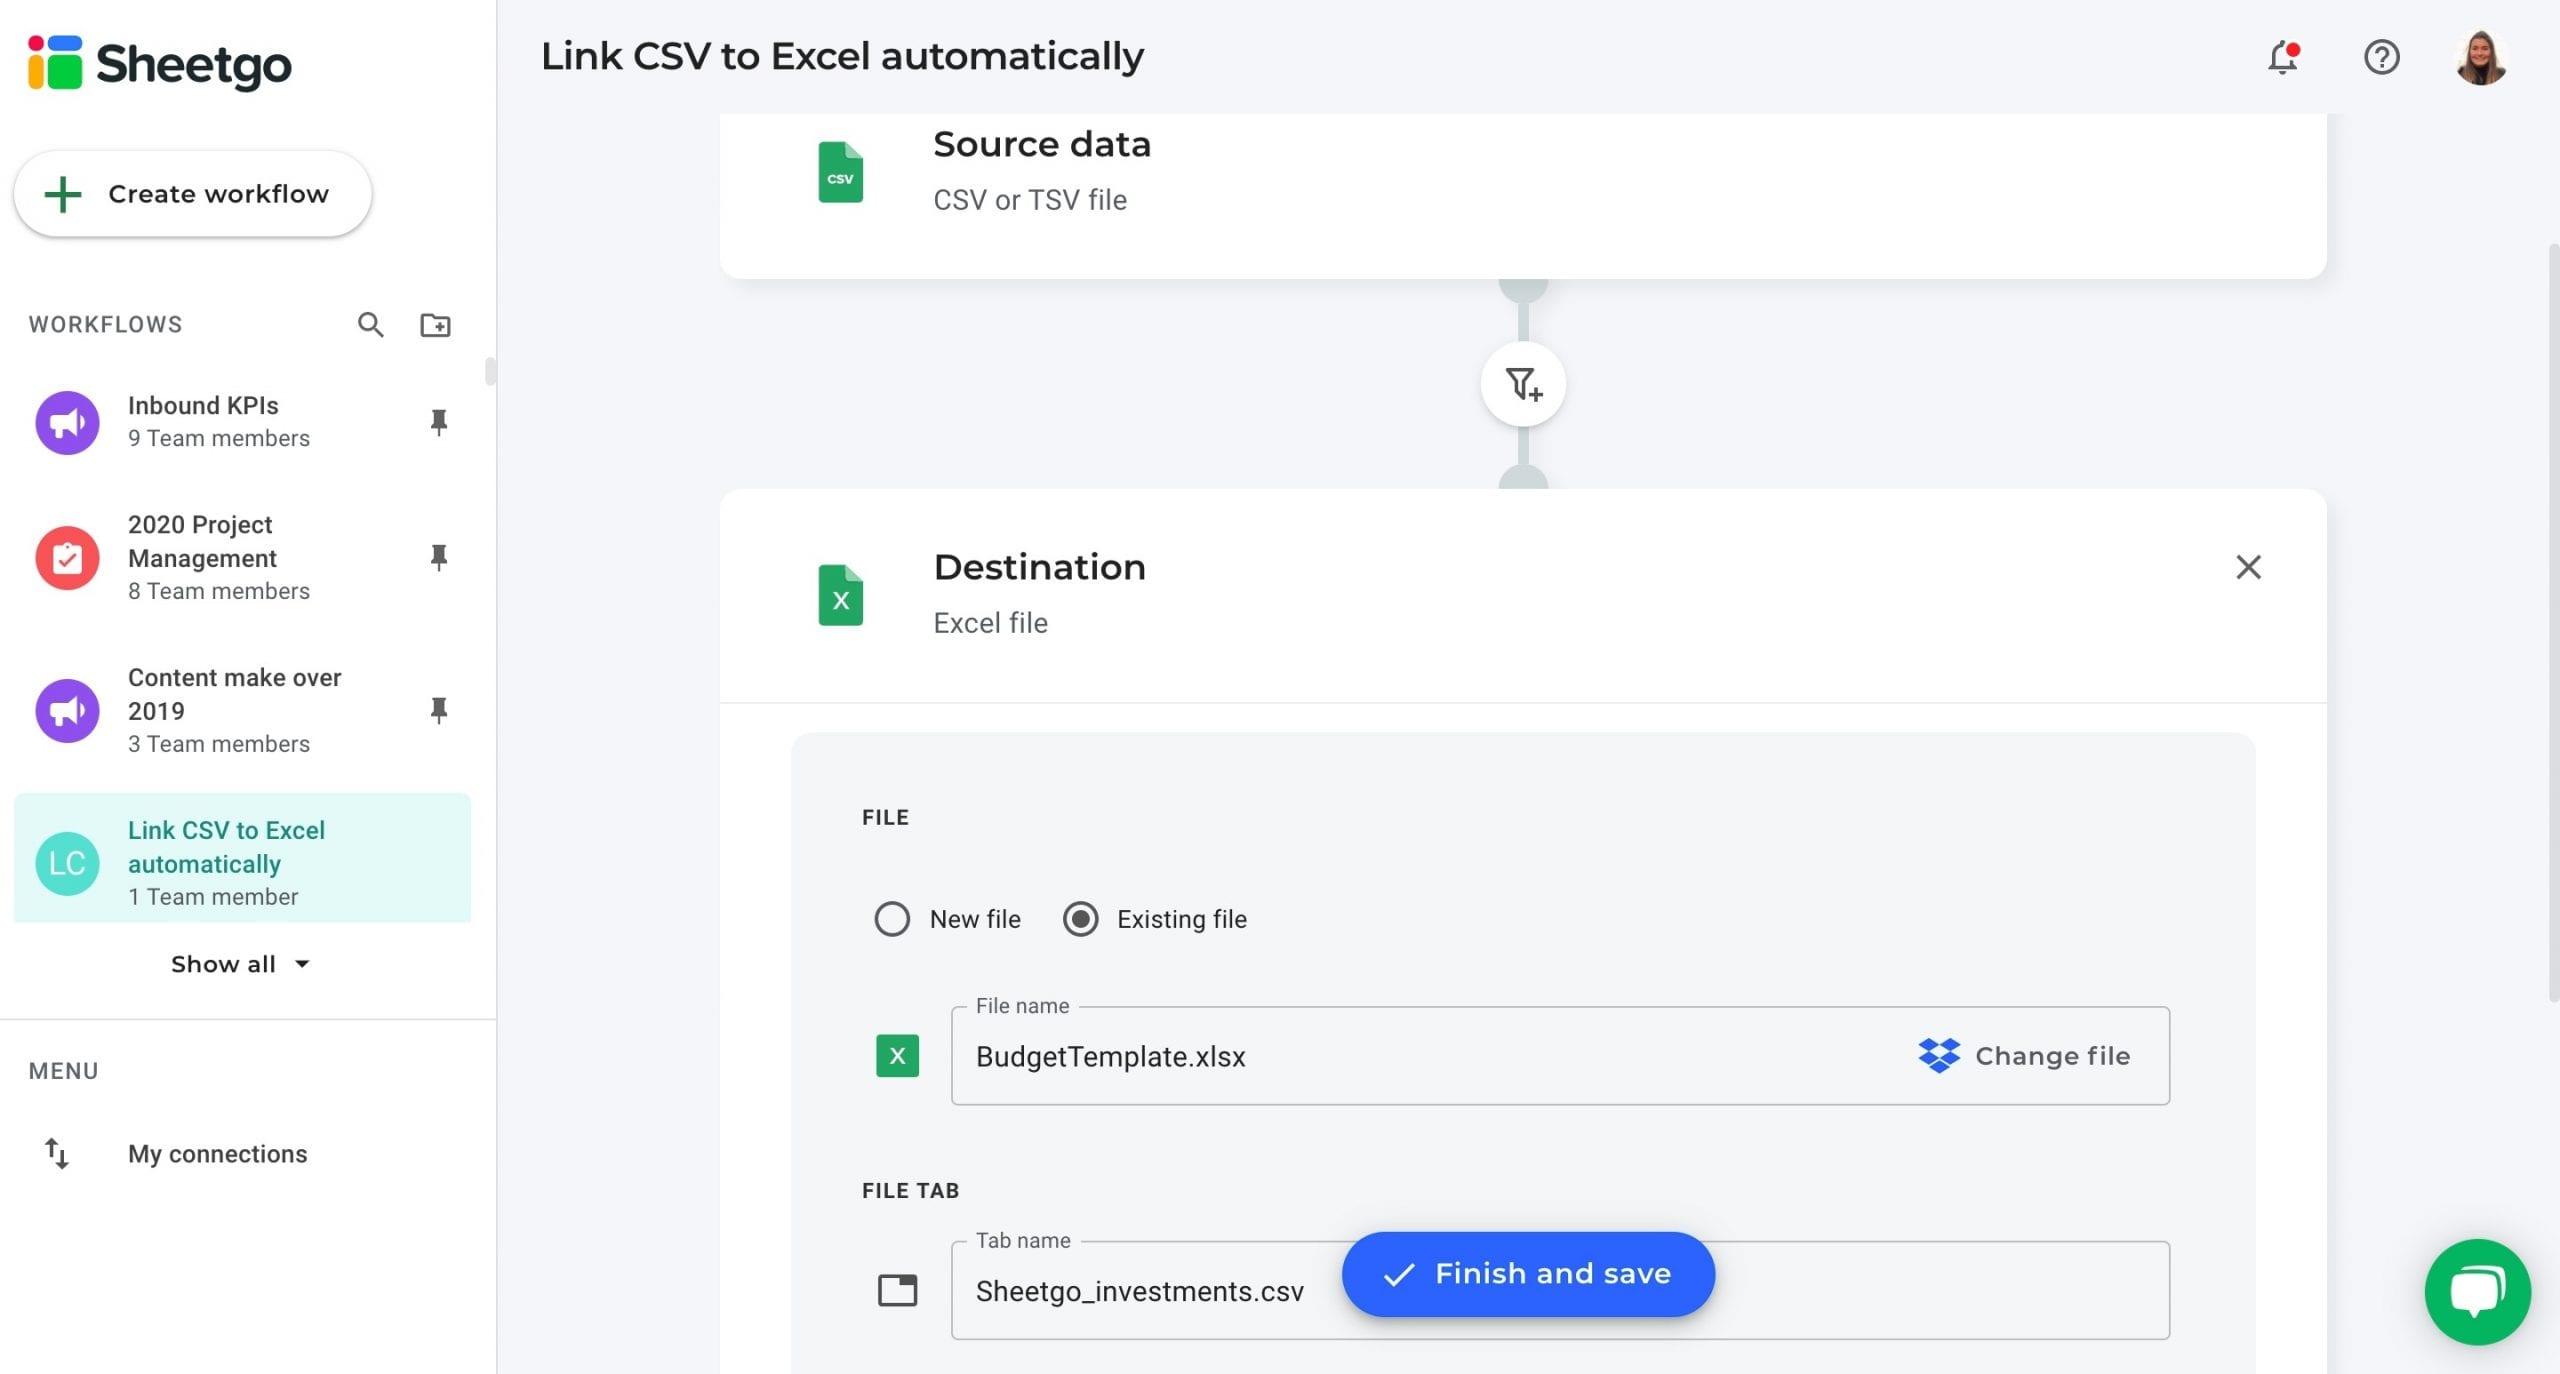 Link CSV to Excel data destination